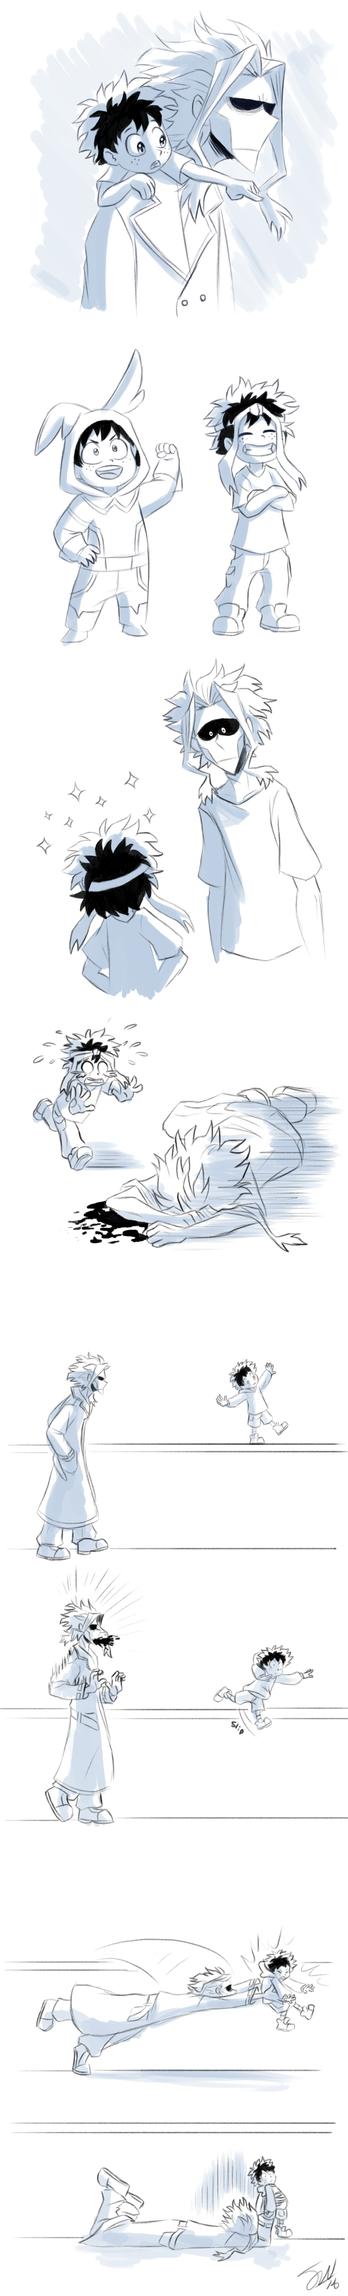 Boku no Hero Academia - collage of dad might by TC-96